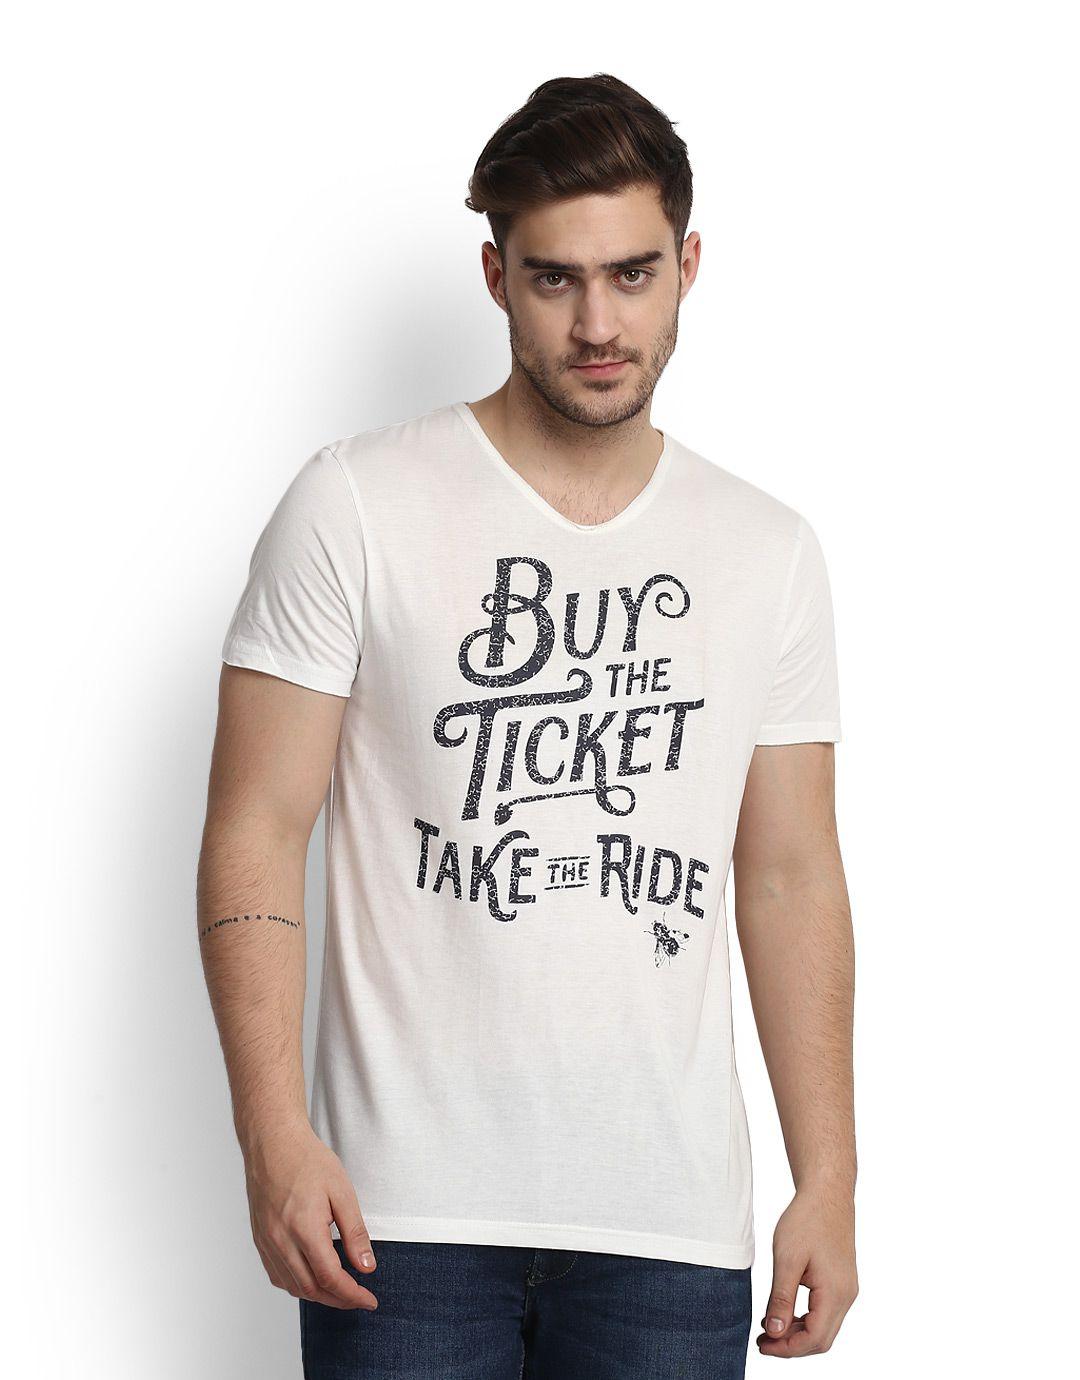 People White V-Neck T-Shirt